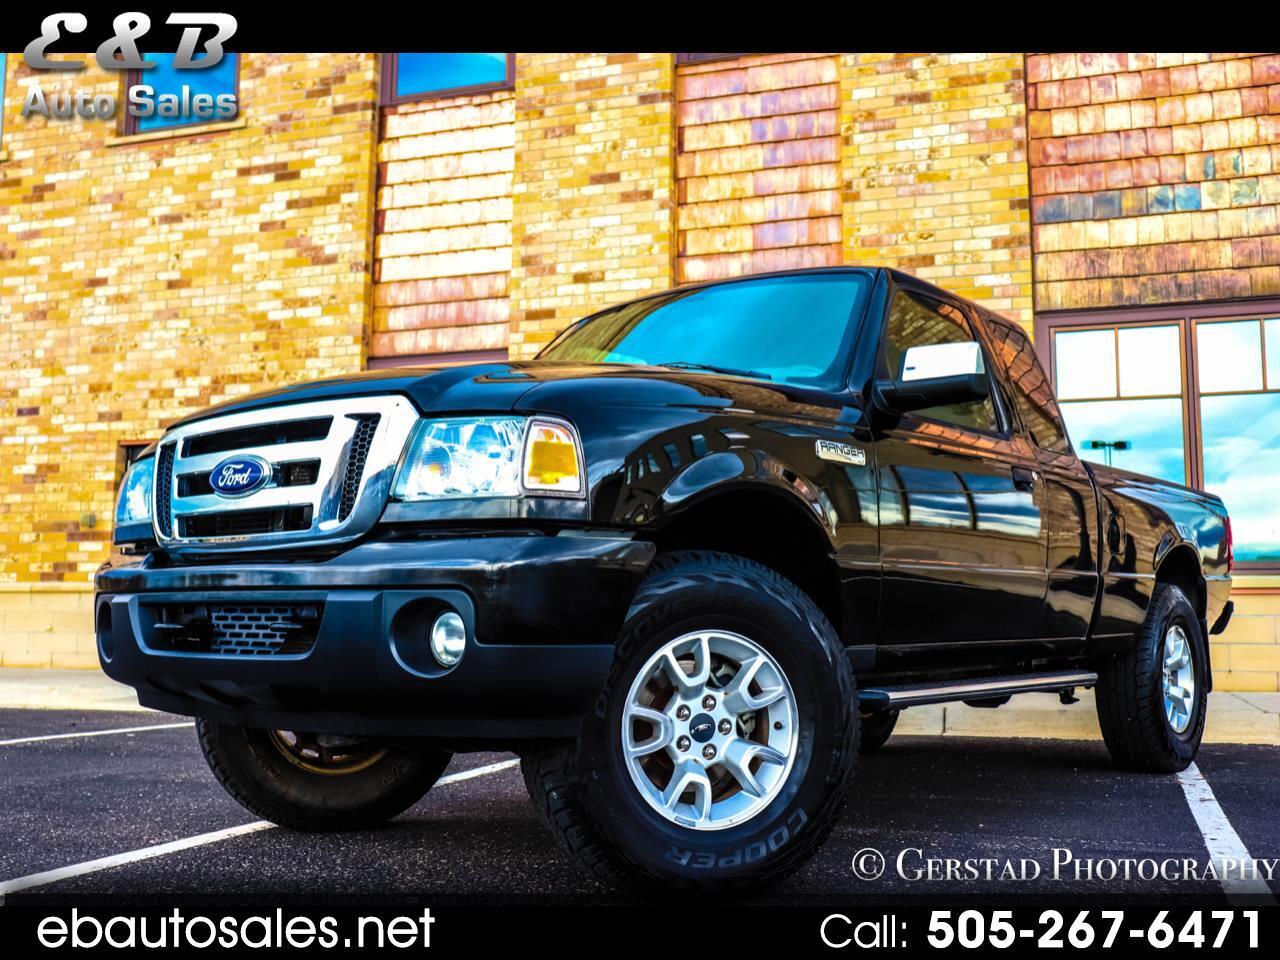 Ford Ranger XLT SuperCab 4-Door 4WD 2010